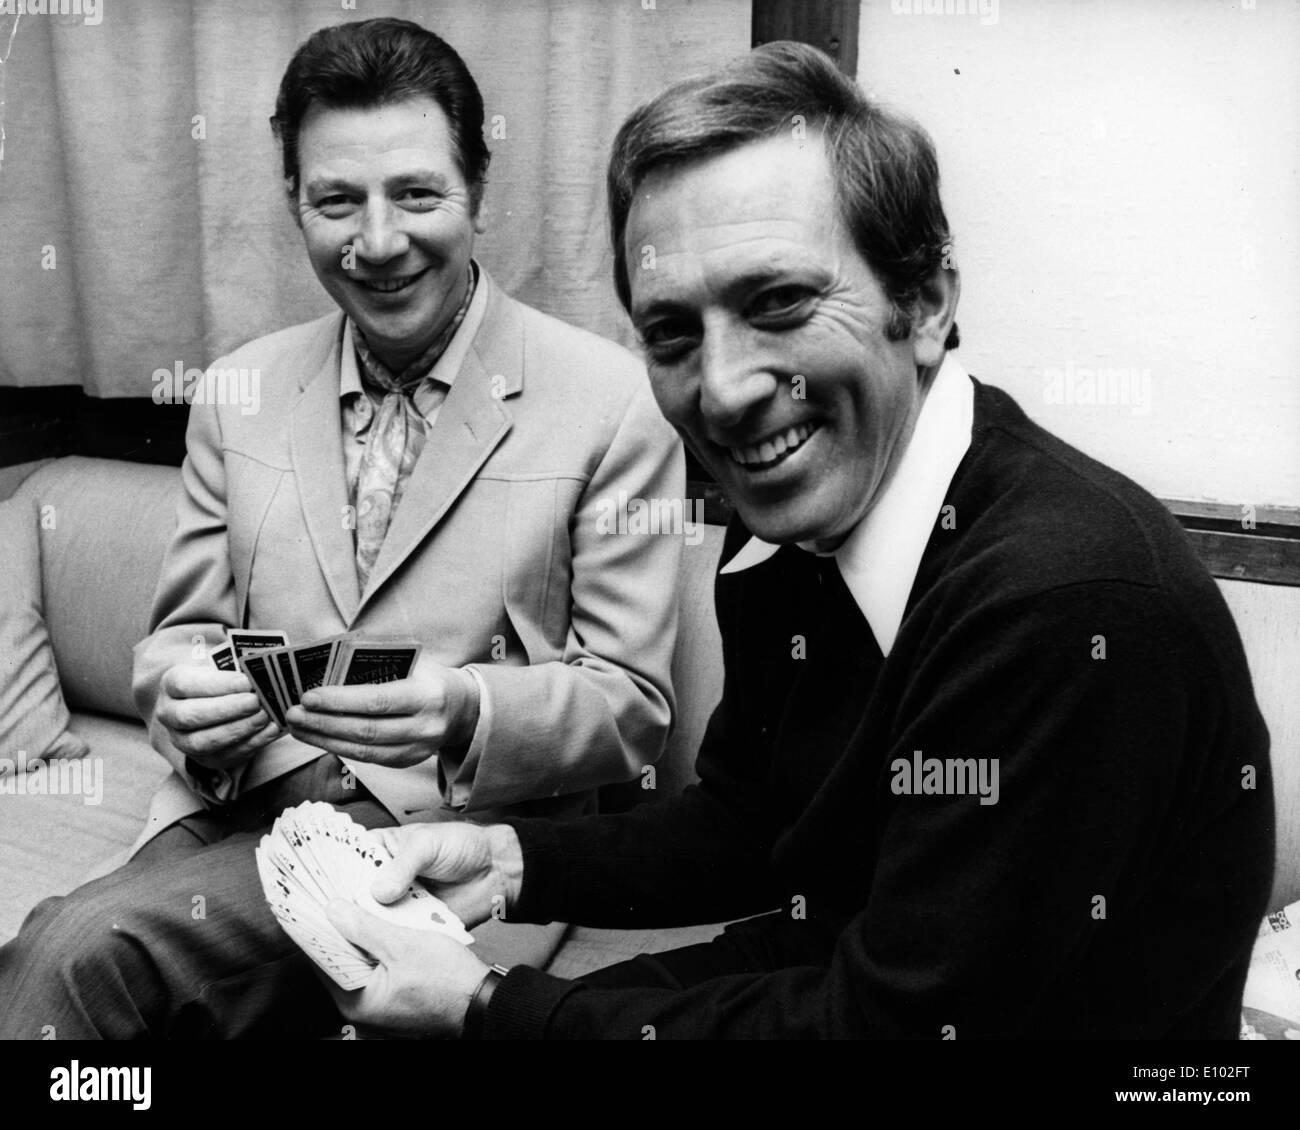 Andy Williams Show Stockfotos & Andy Williams Show Bilder - Alamy